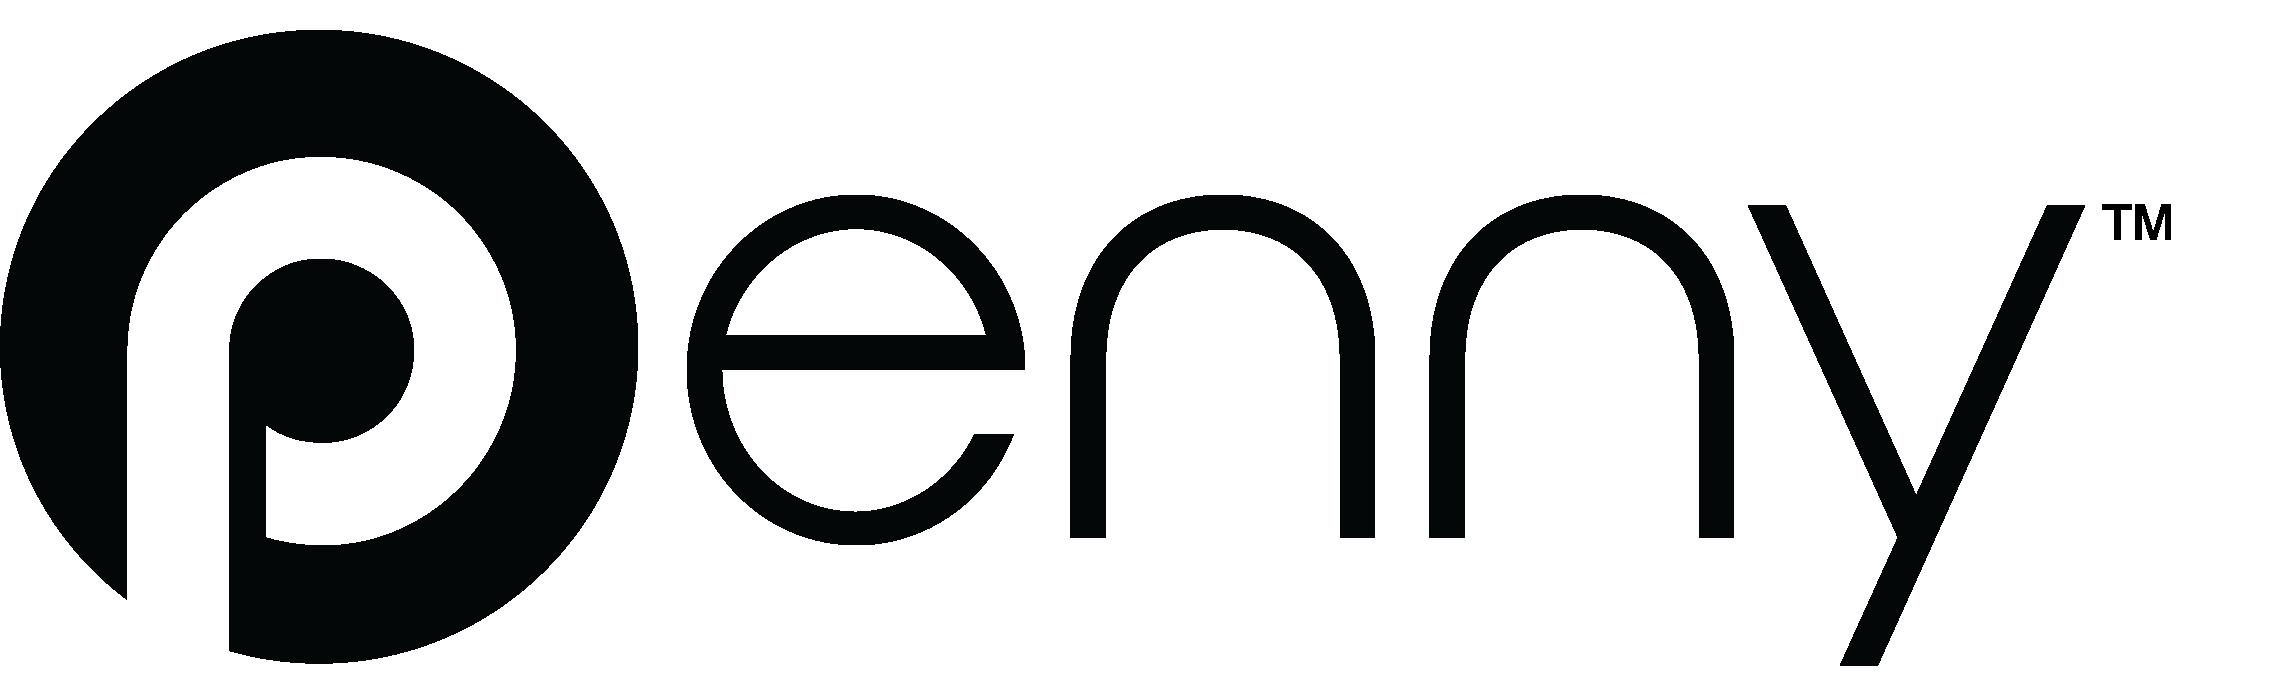 penny inc logo